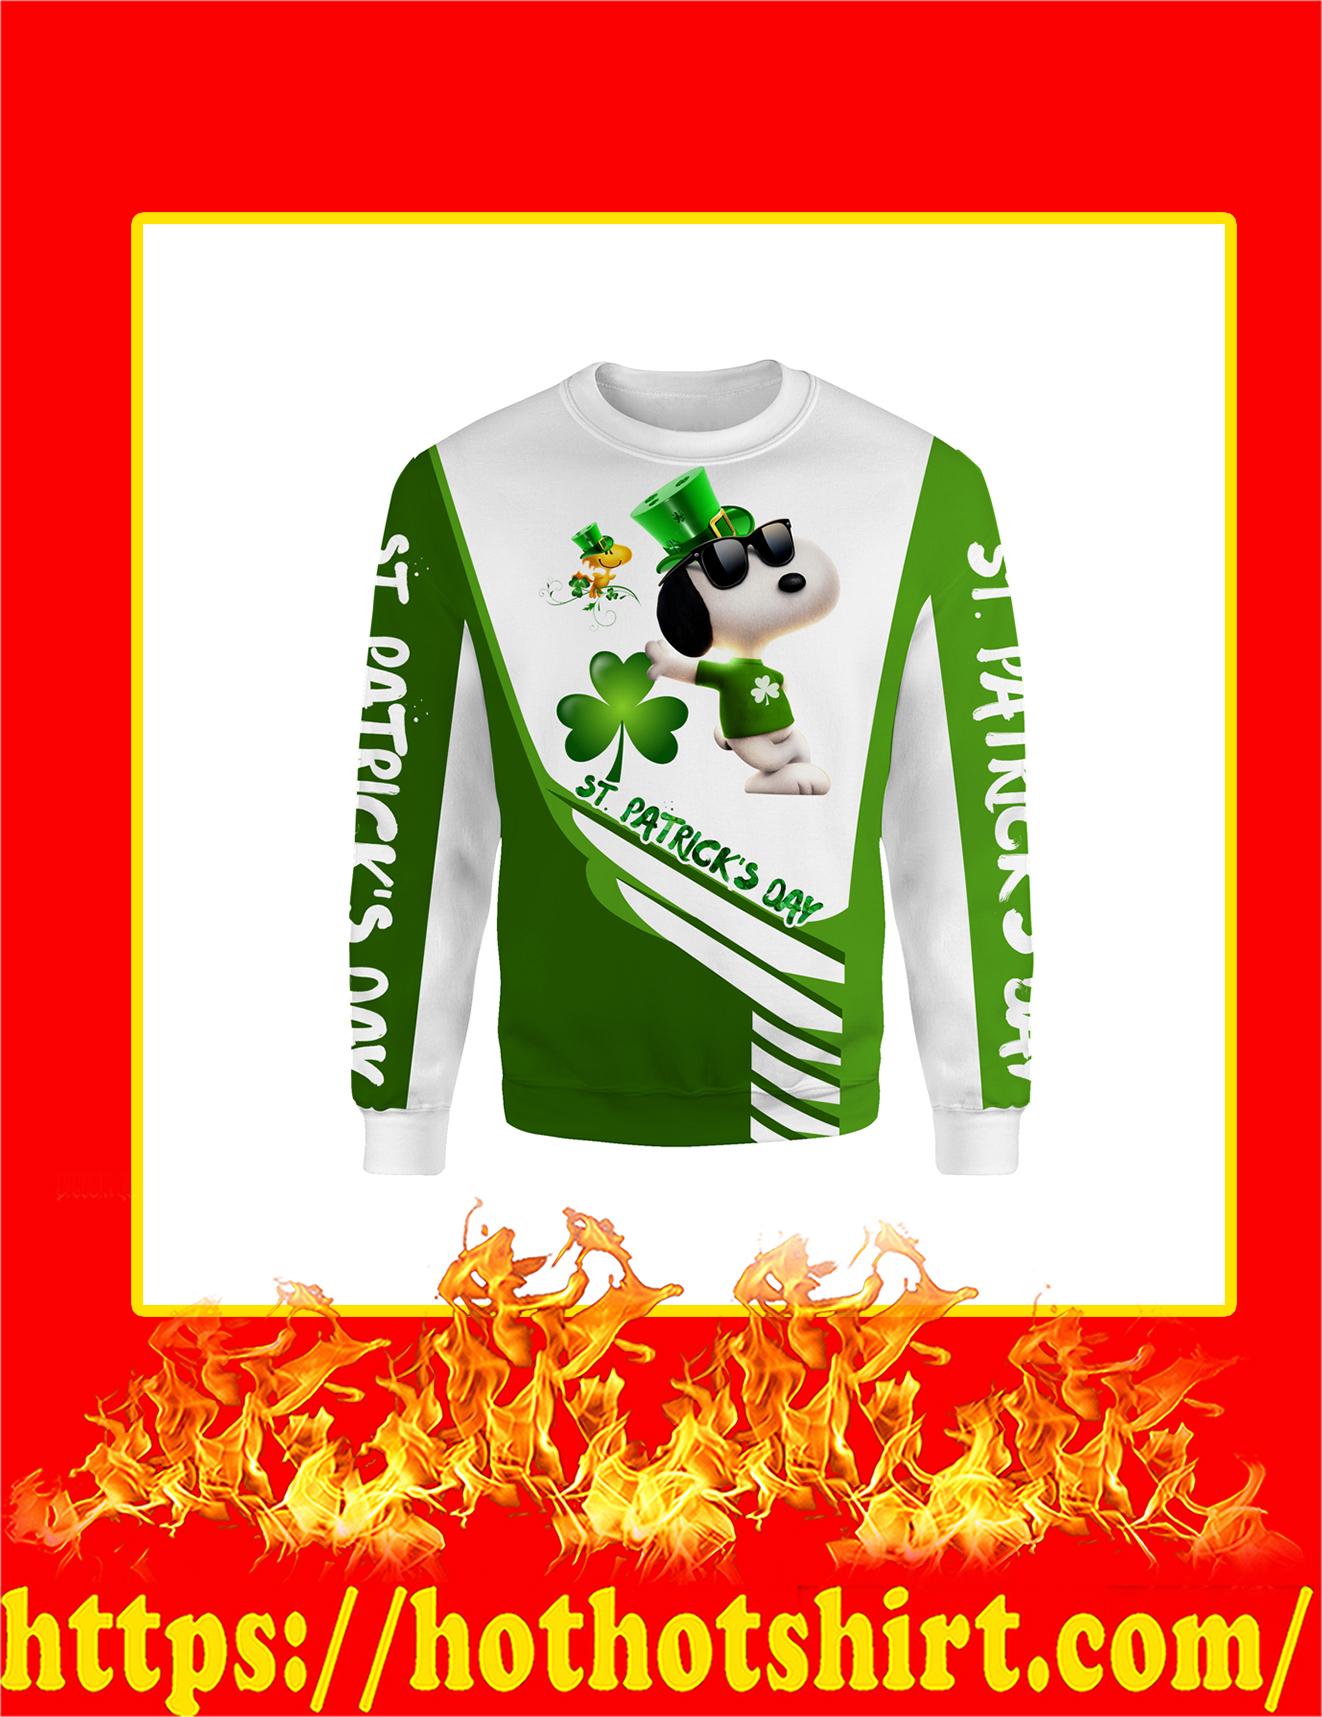 Irish Saint Patrick's Day Snoopy All Over Print Sweatshirt